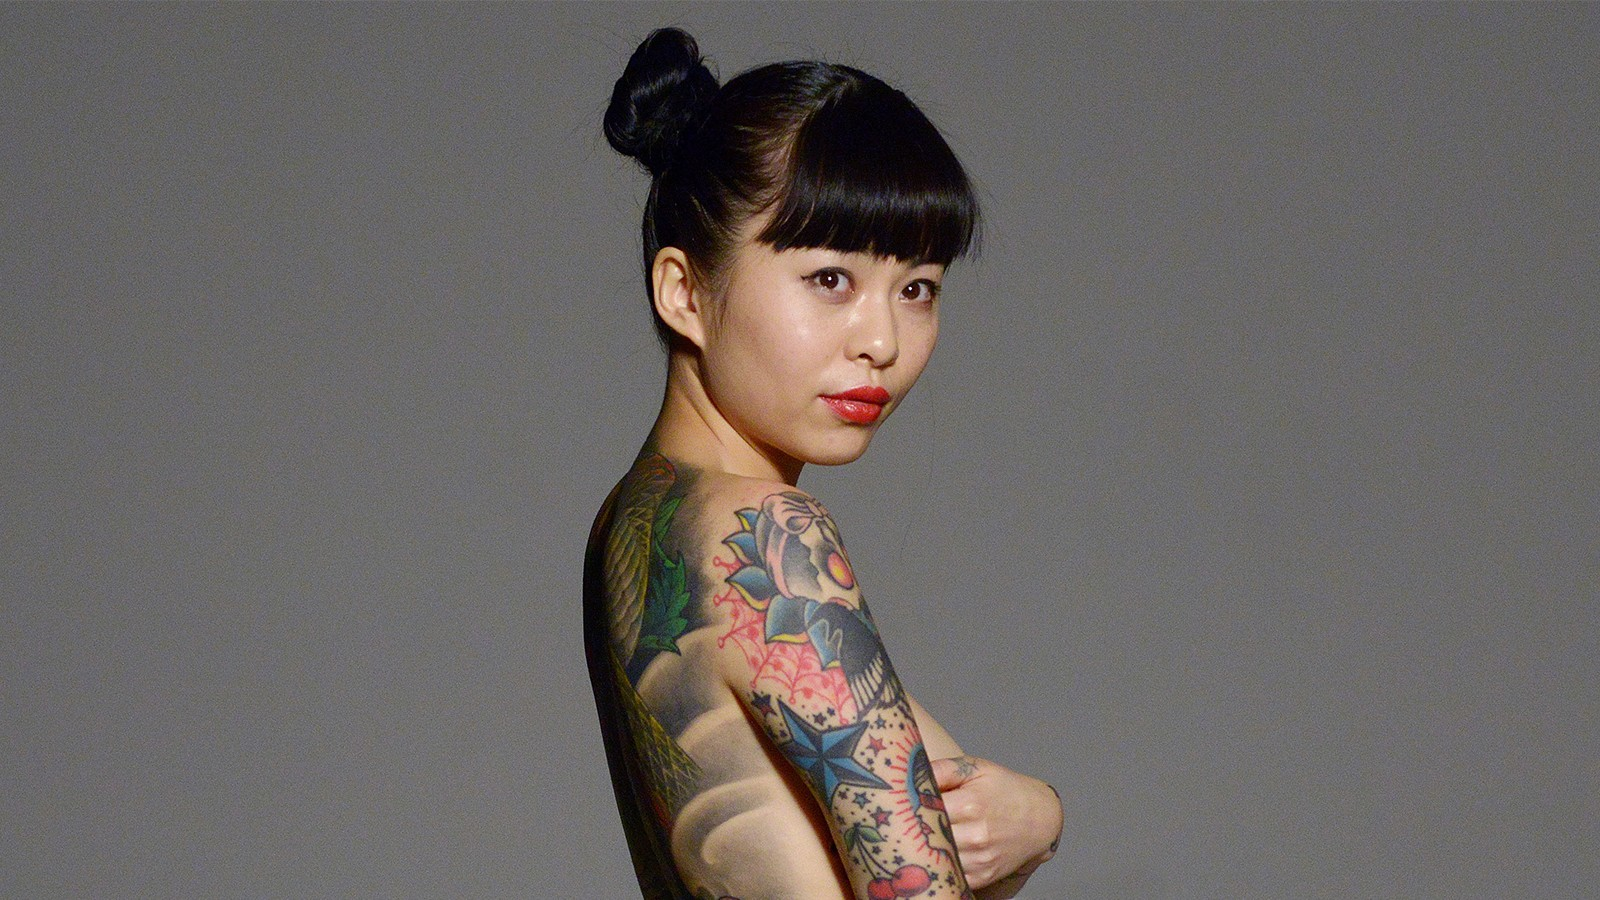 Monami frost 1438 808 wallpaper -  9 For Chinese Tattoos No Longer Taboo Cnn